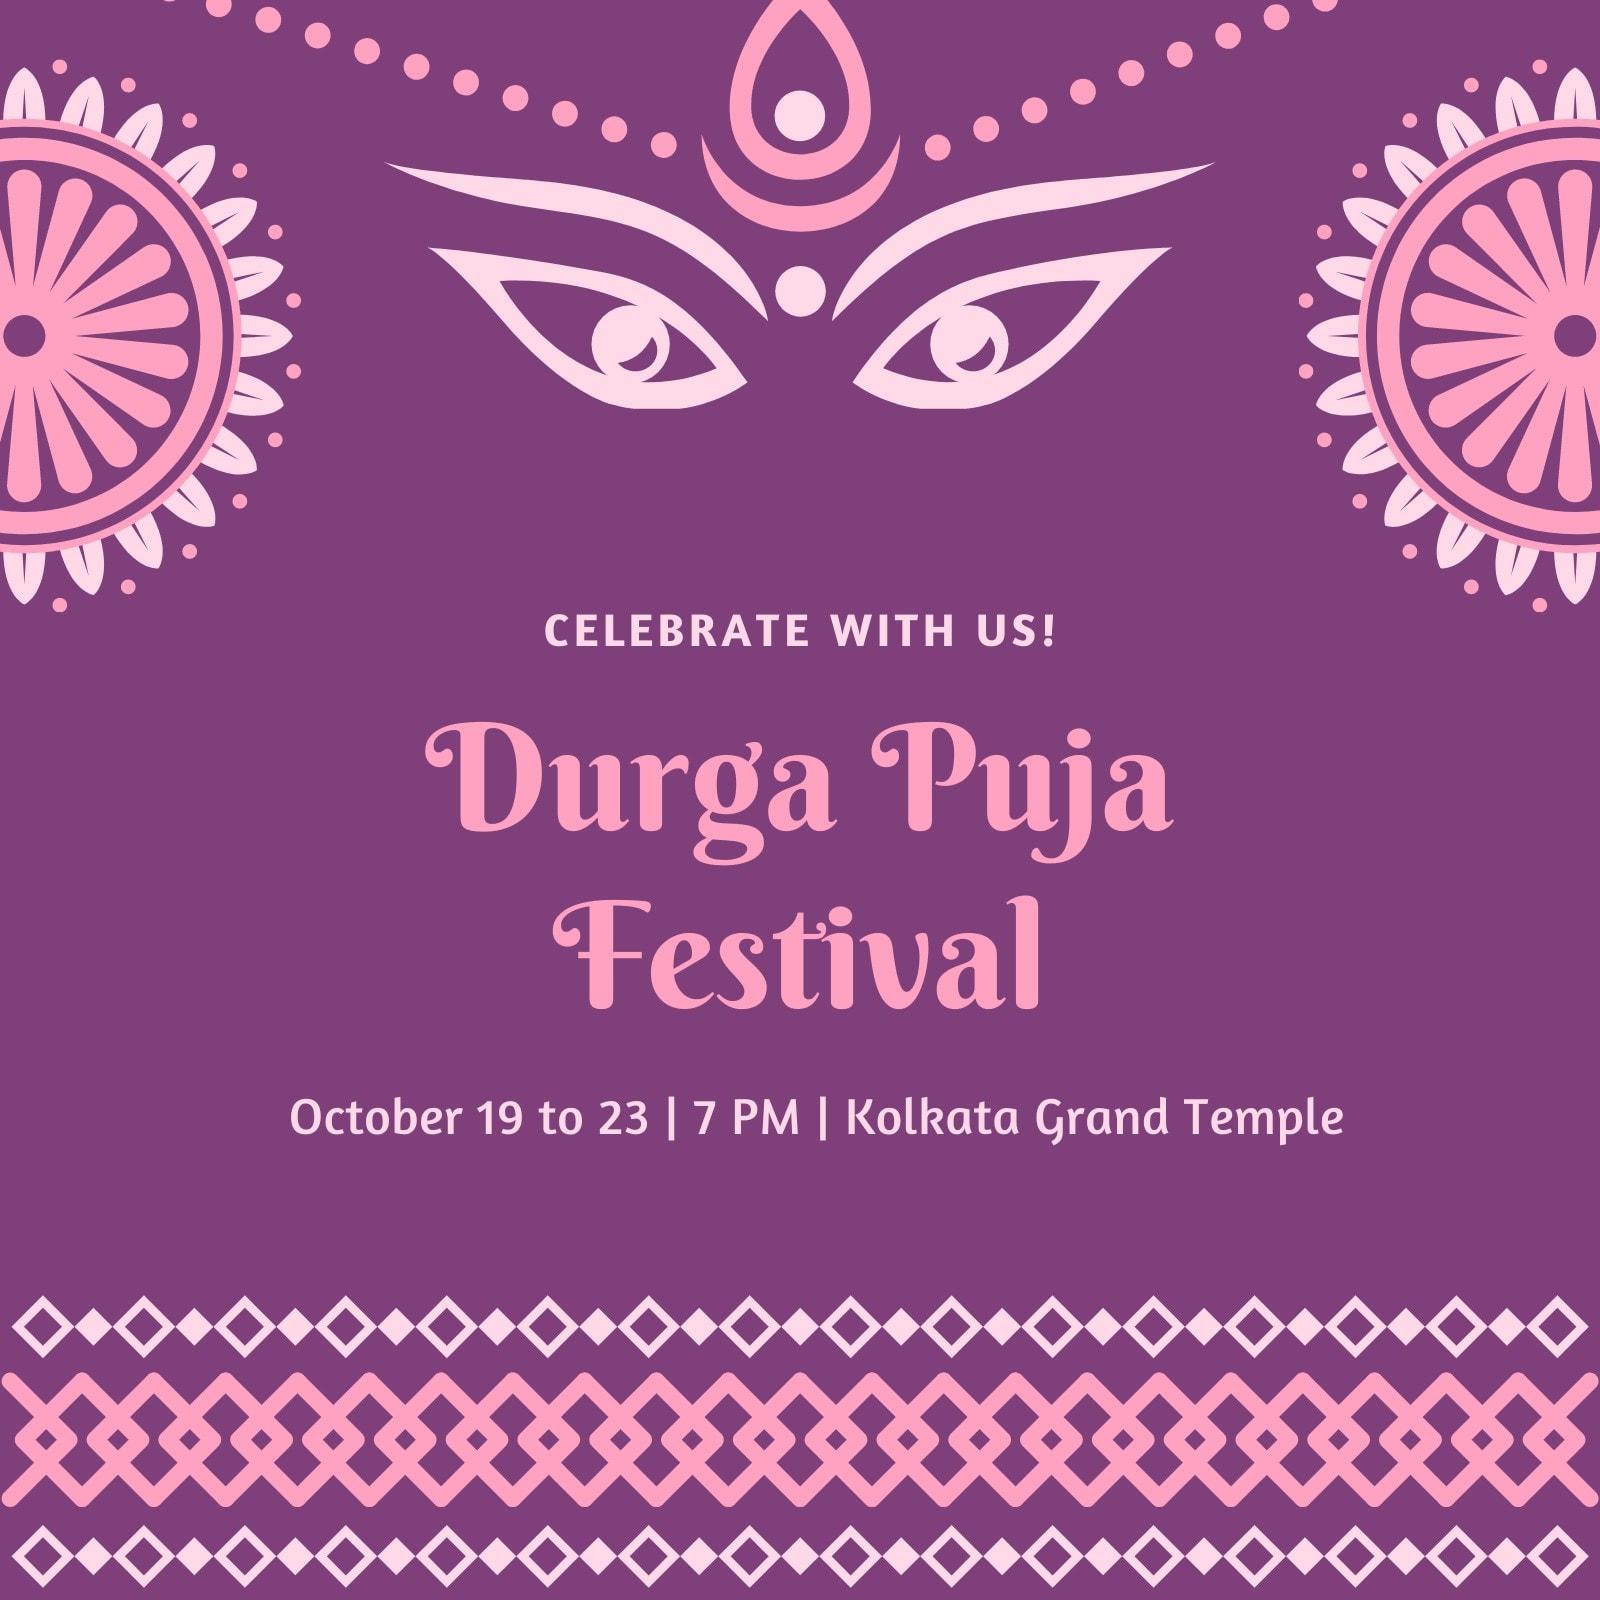 Pink and Purple Durga Puja Festival Instagram Post